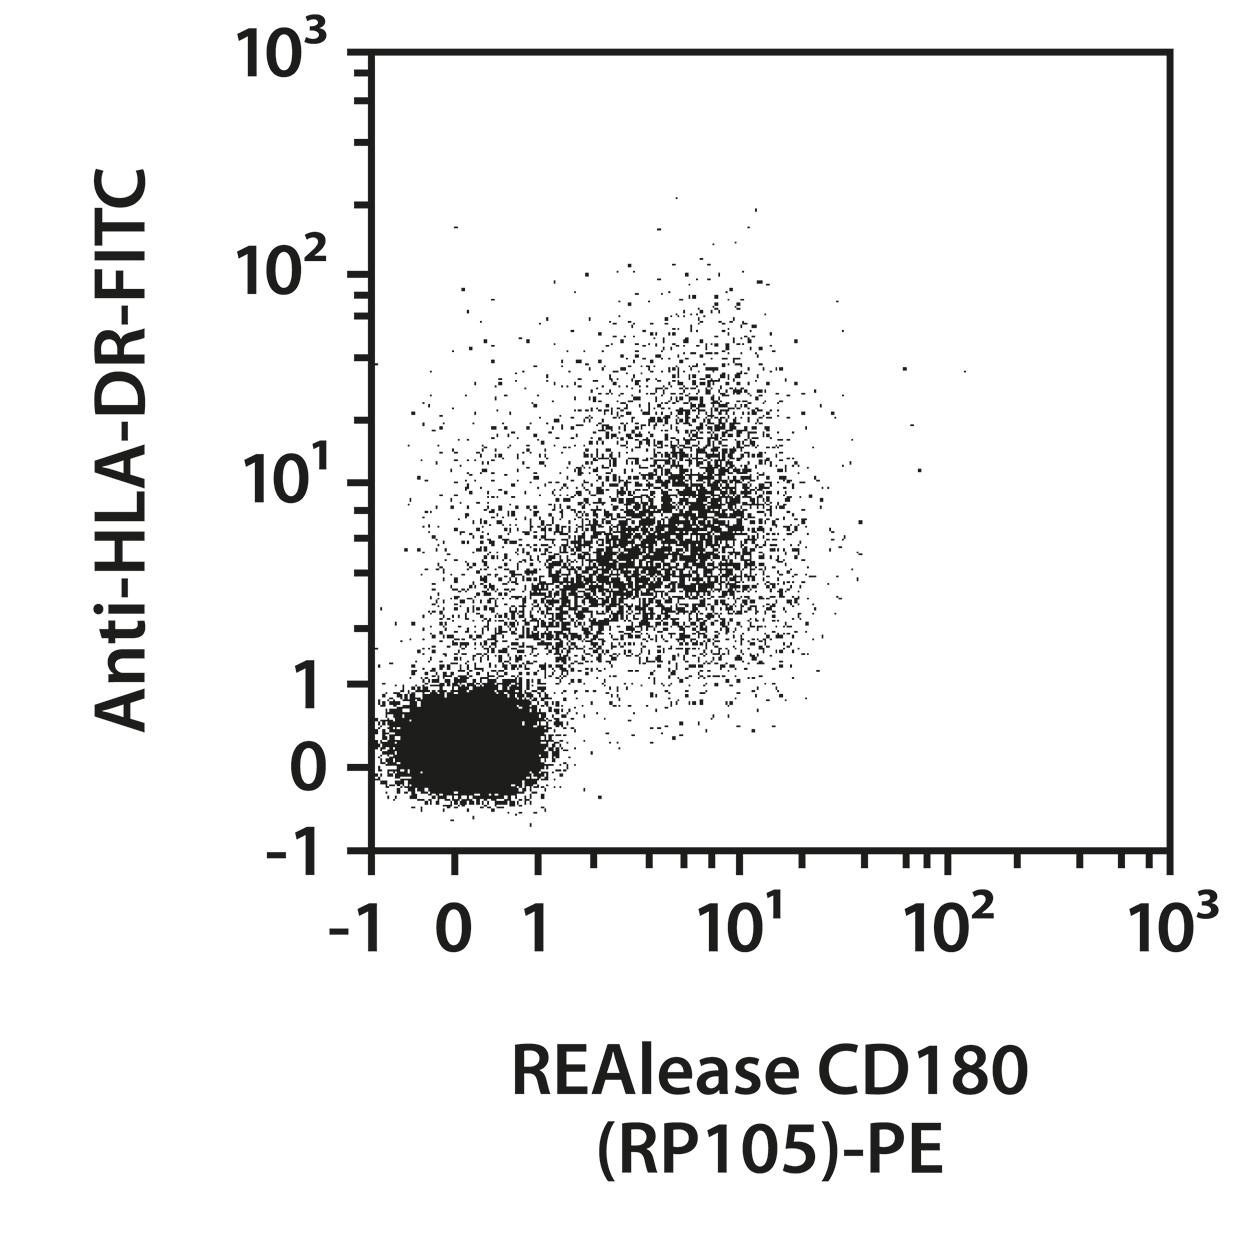 CD180 (RP105) Antibody, anti-human, REAlease®